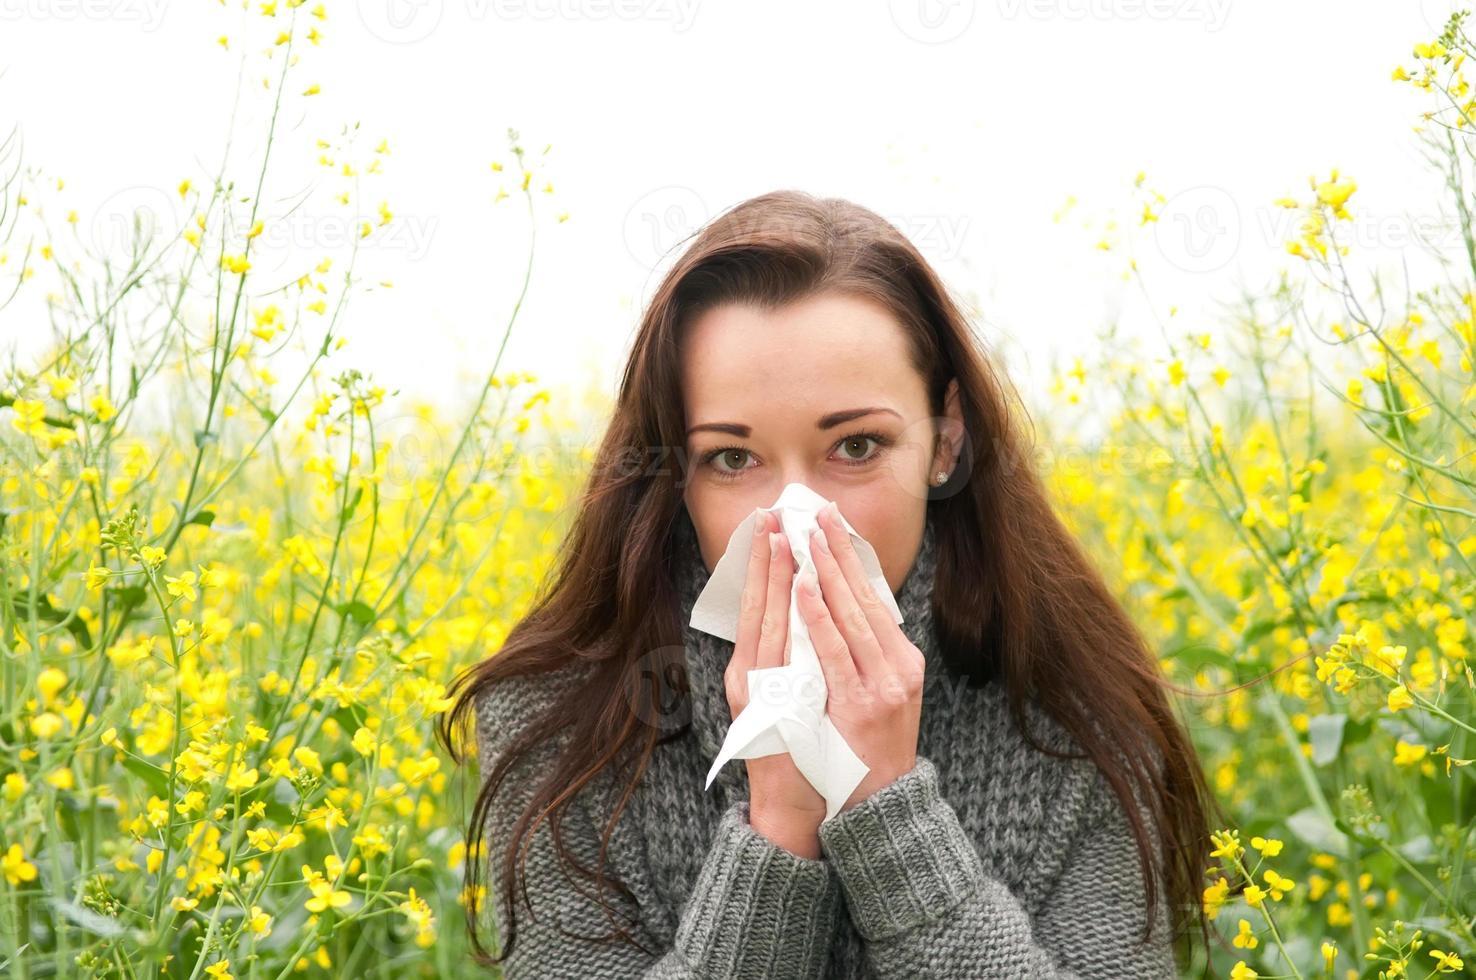 Frau, die Nase in einem Blumenfeld bläst foto